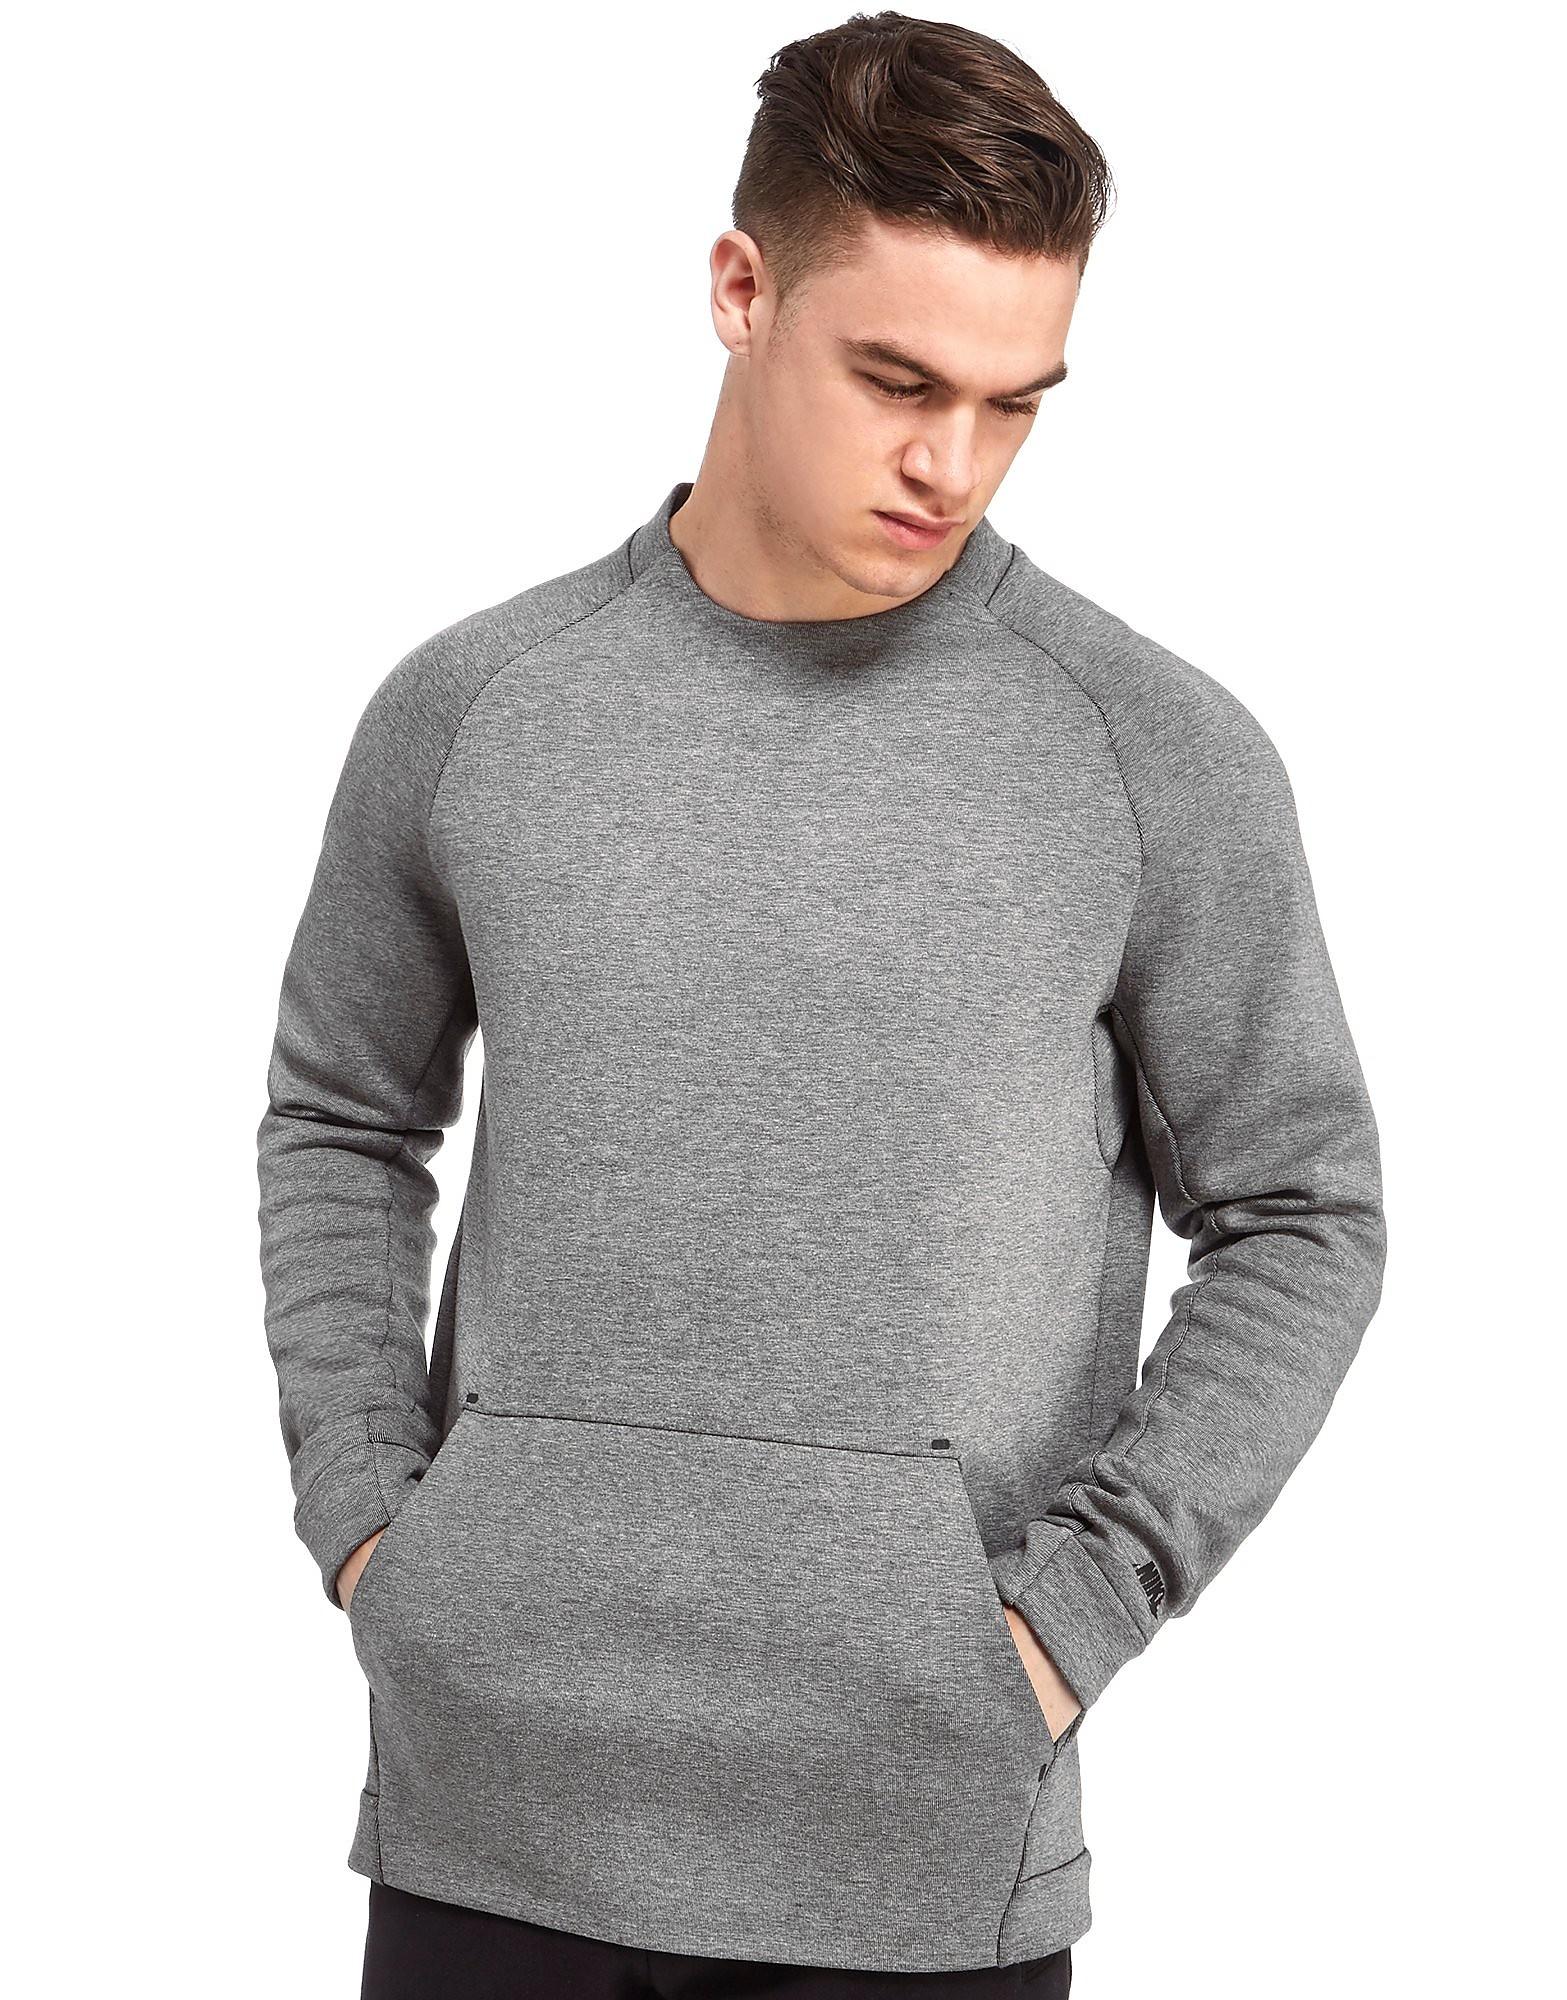 Nike Tech Fleece Crew tröja